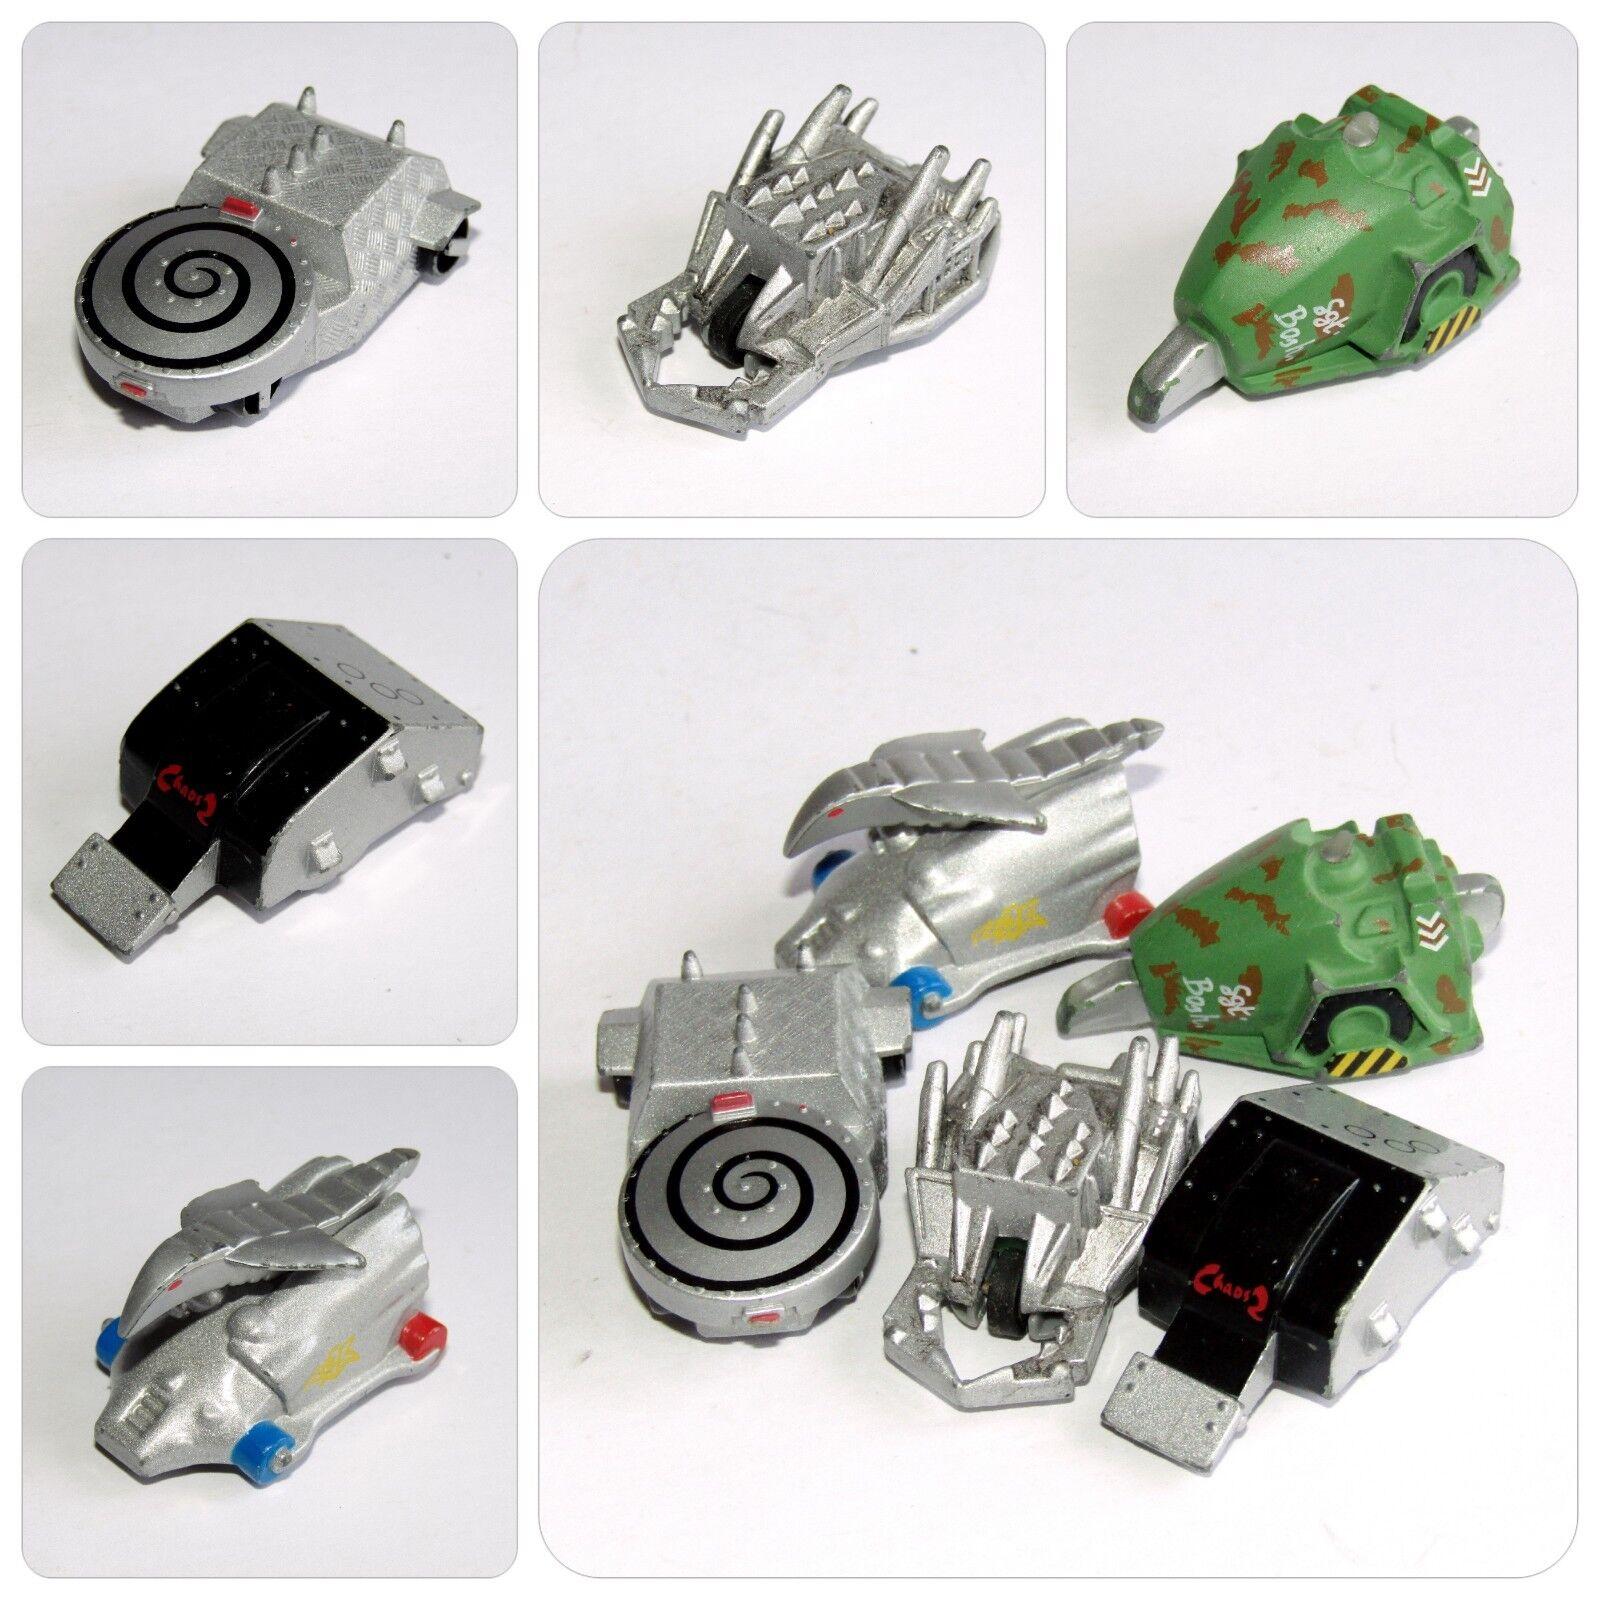 BBC Robot Wars MINIBOTS x 5 Razar, Chaos 2, Sgt. Bash, Hypdo-Disc, Dead Metal